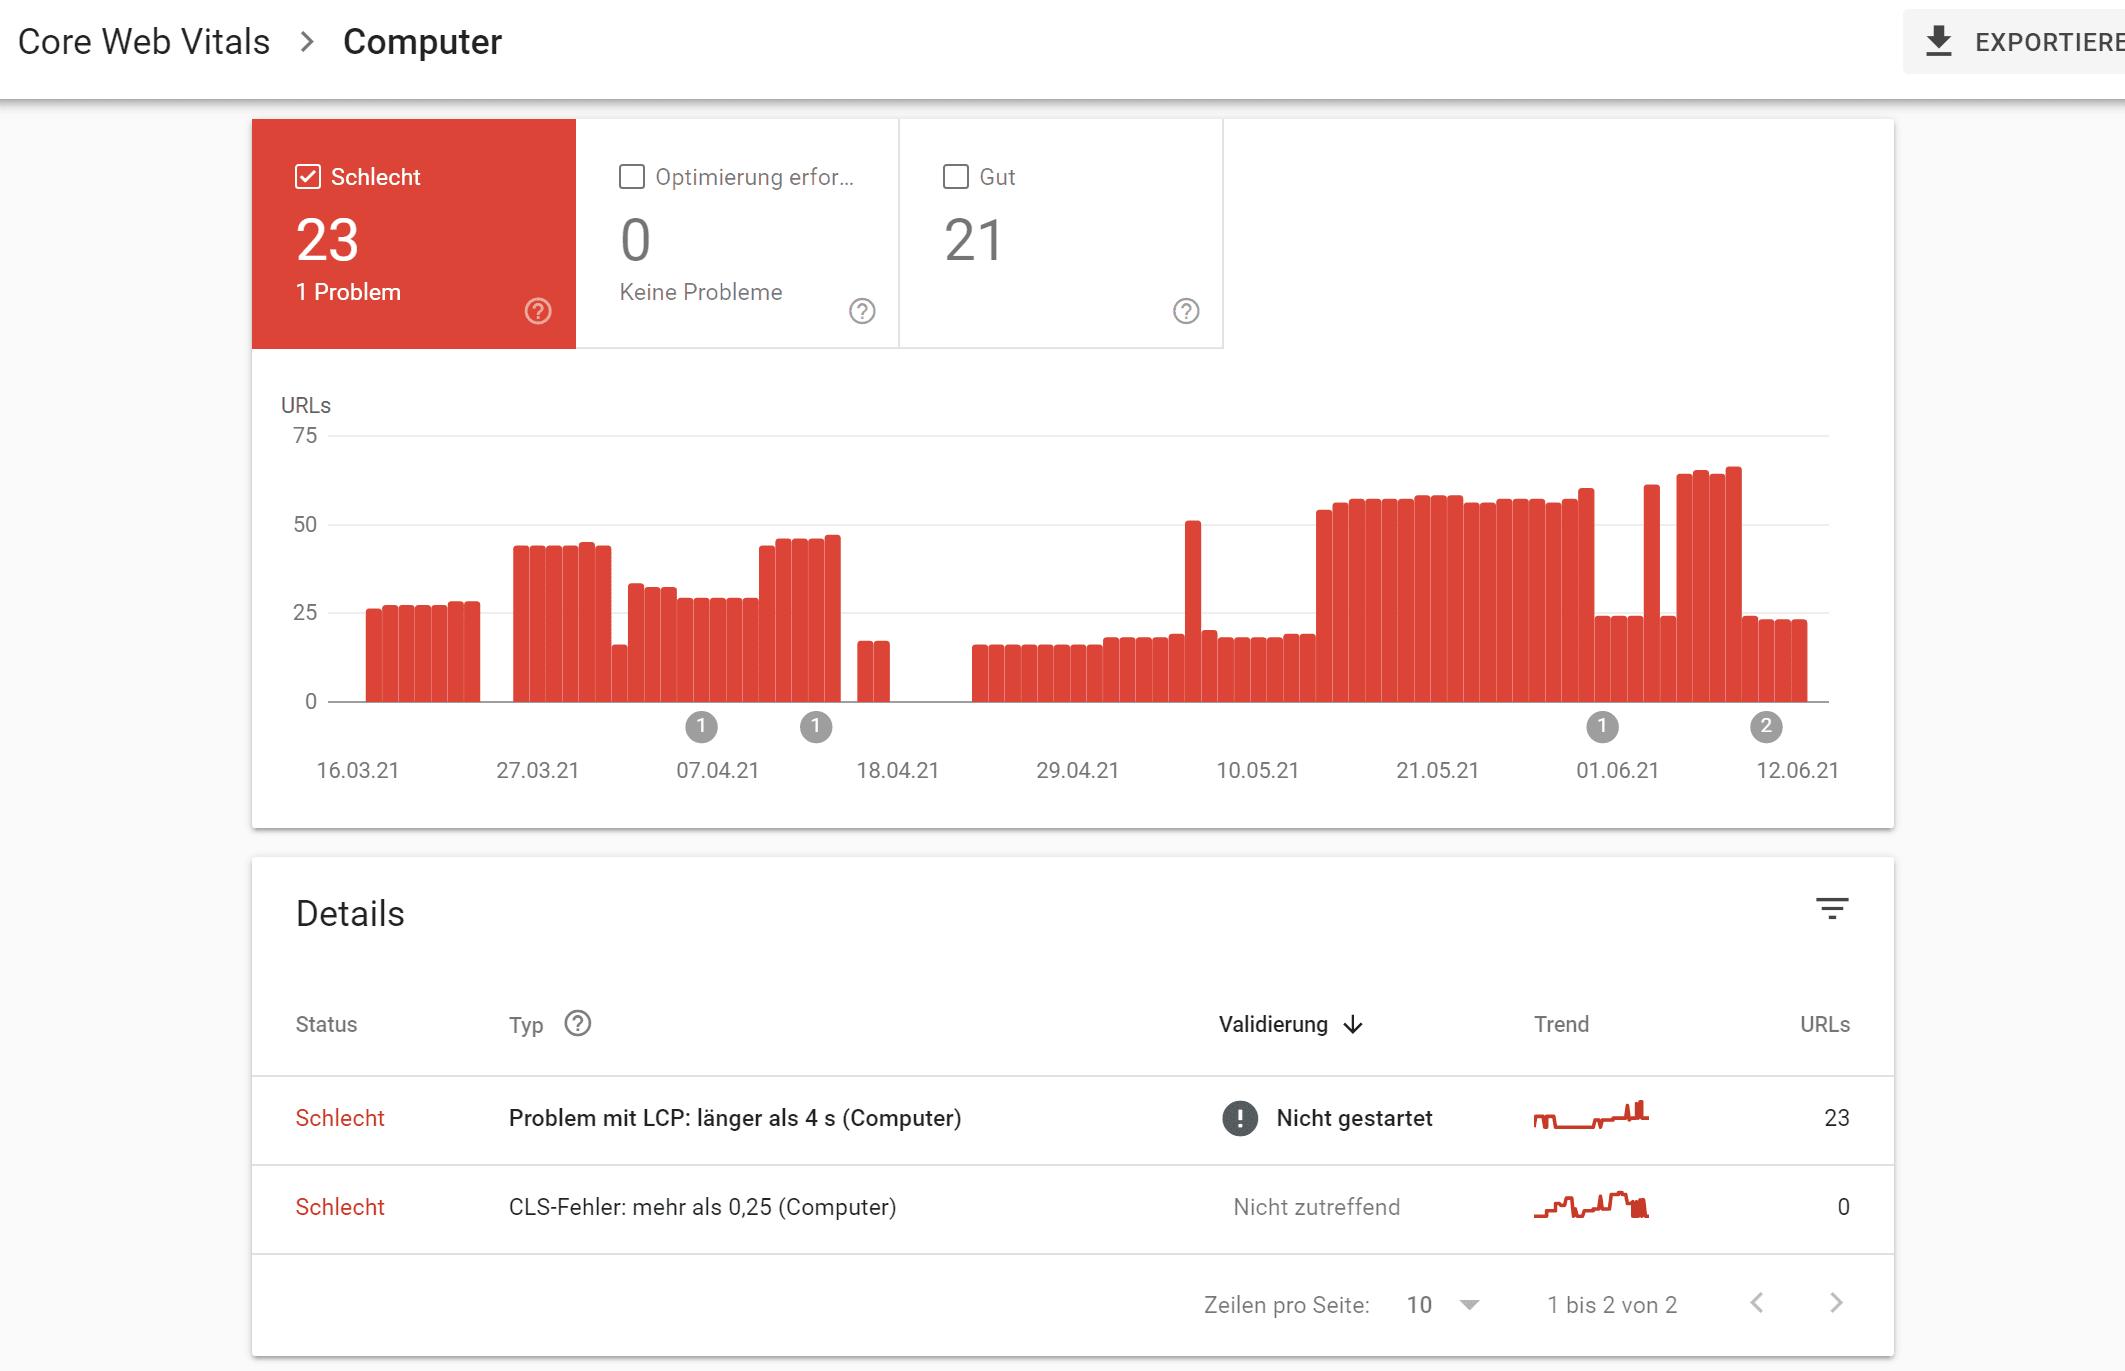 Core Web Vitals Bericht